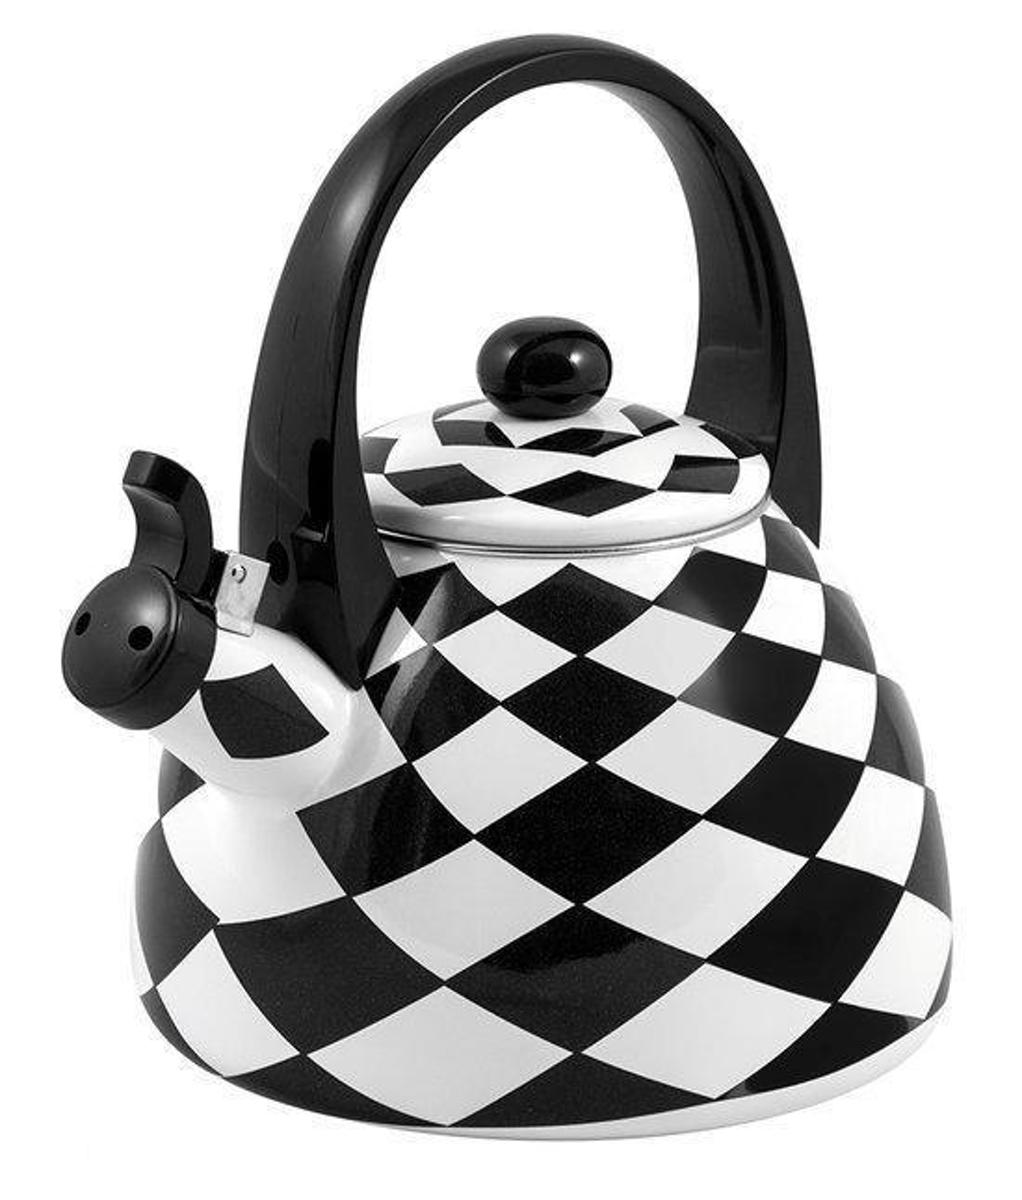 Kuppels Fluitketel Zwart-wit Geblokt  2l kopen